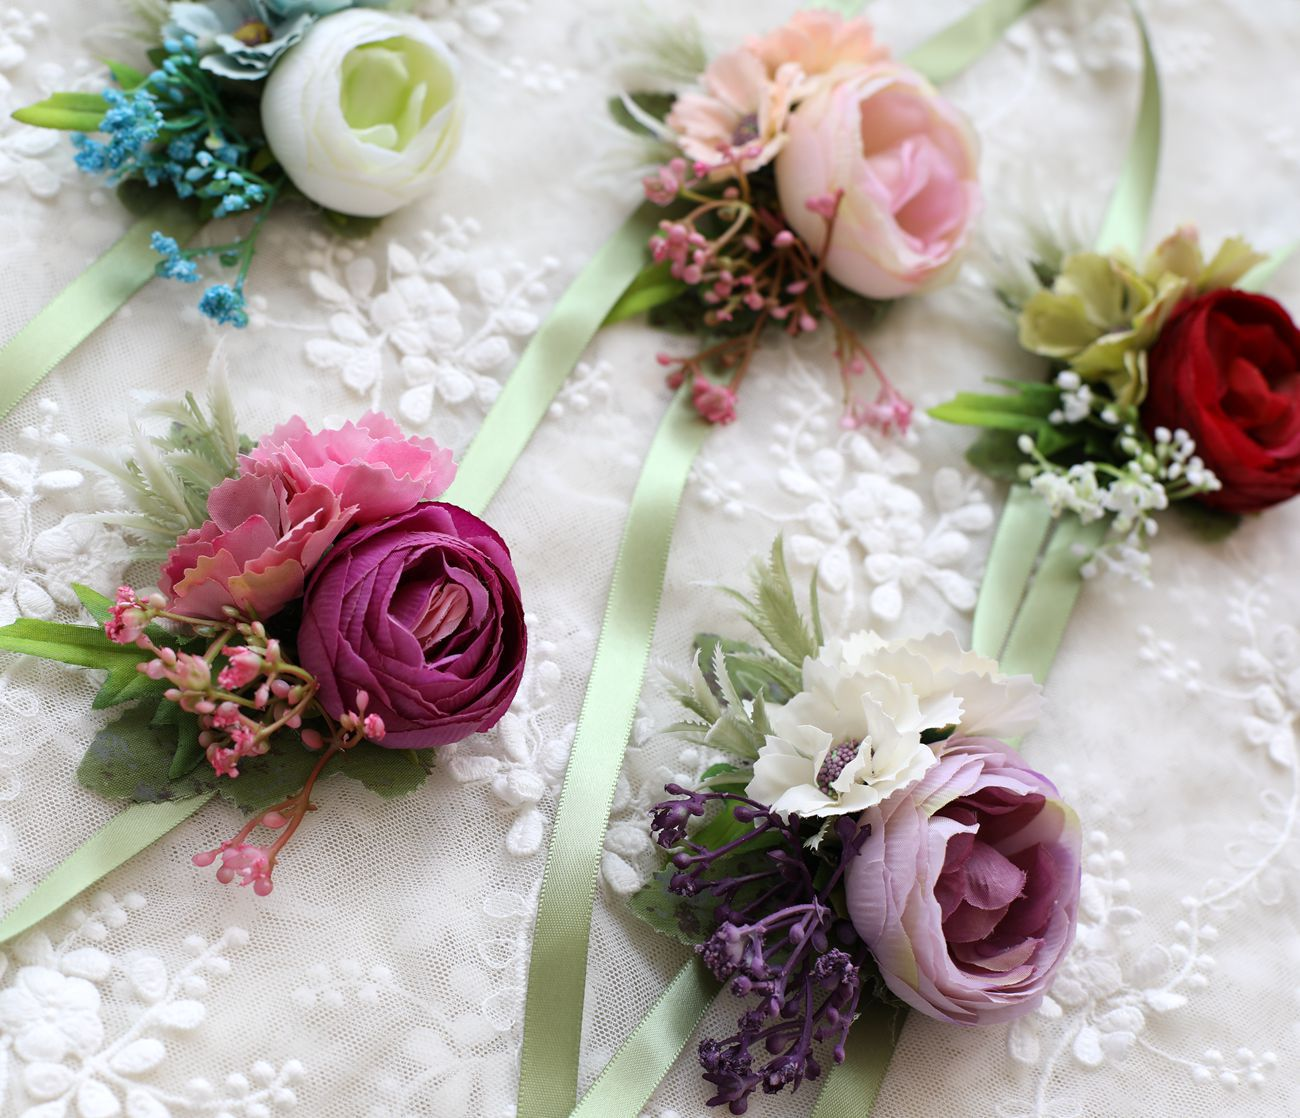 Hand Wrist Flower Purple Flower Bracelet For Bridesmaids Wrist Corsage Pearls Girls Corsage Wrist Corsage Bracelet Flowers Pink